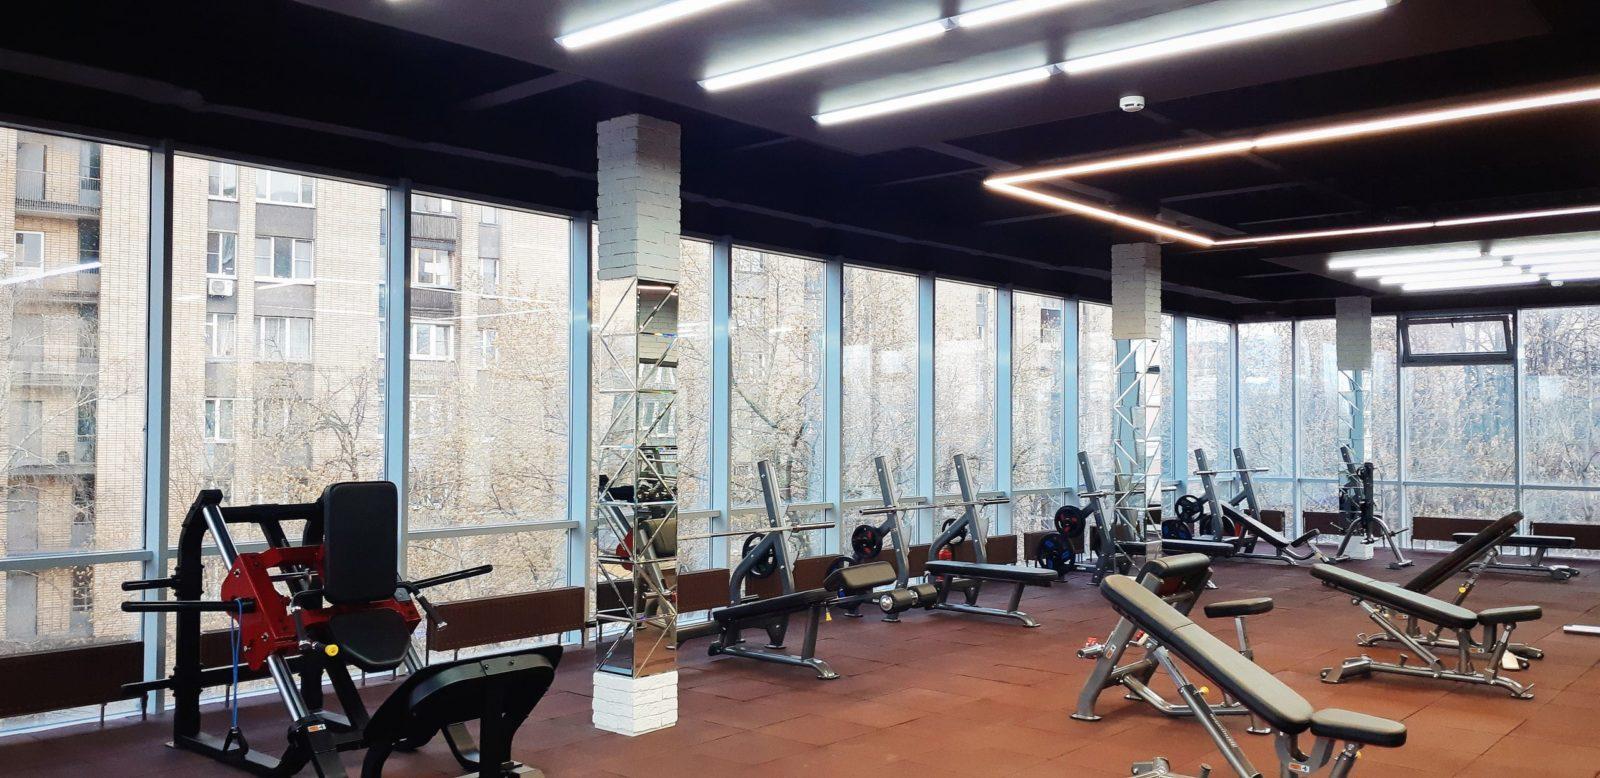 Фитнес-клуб Облака кардиозона